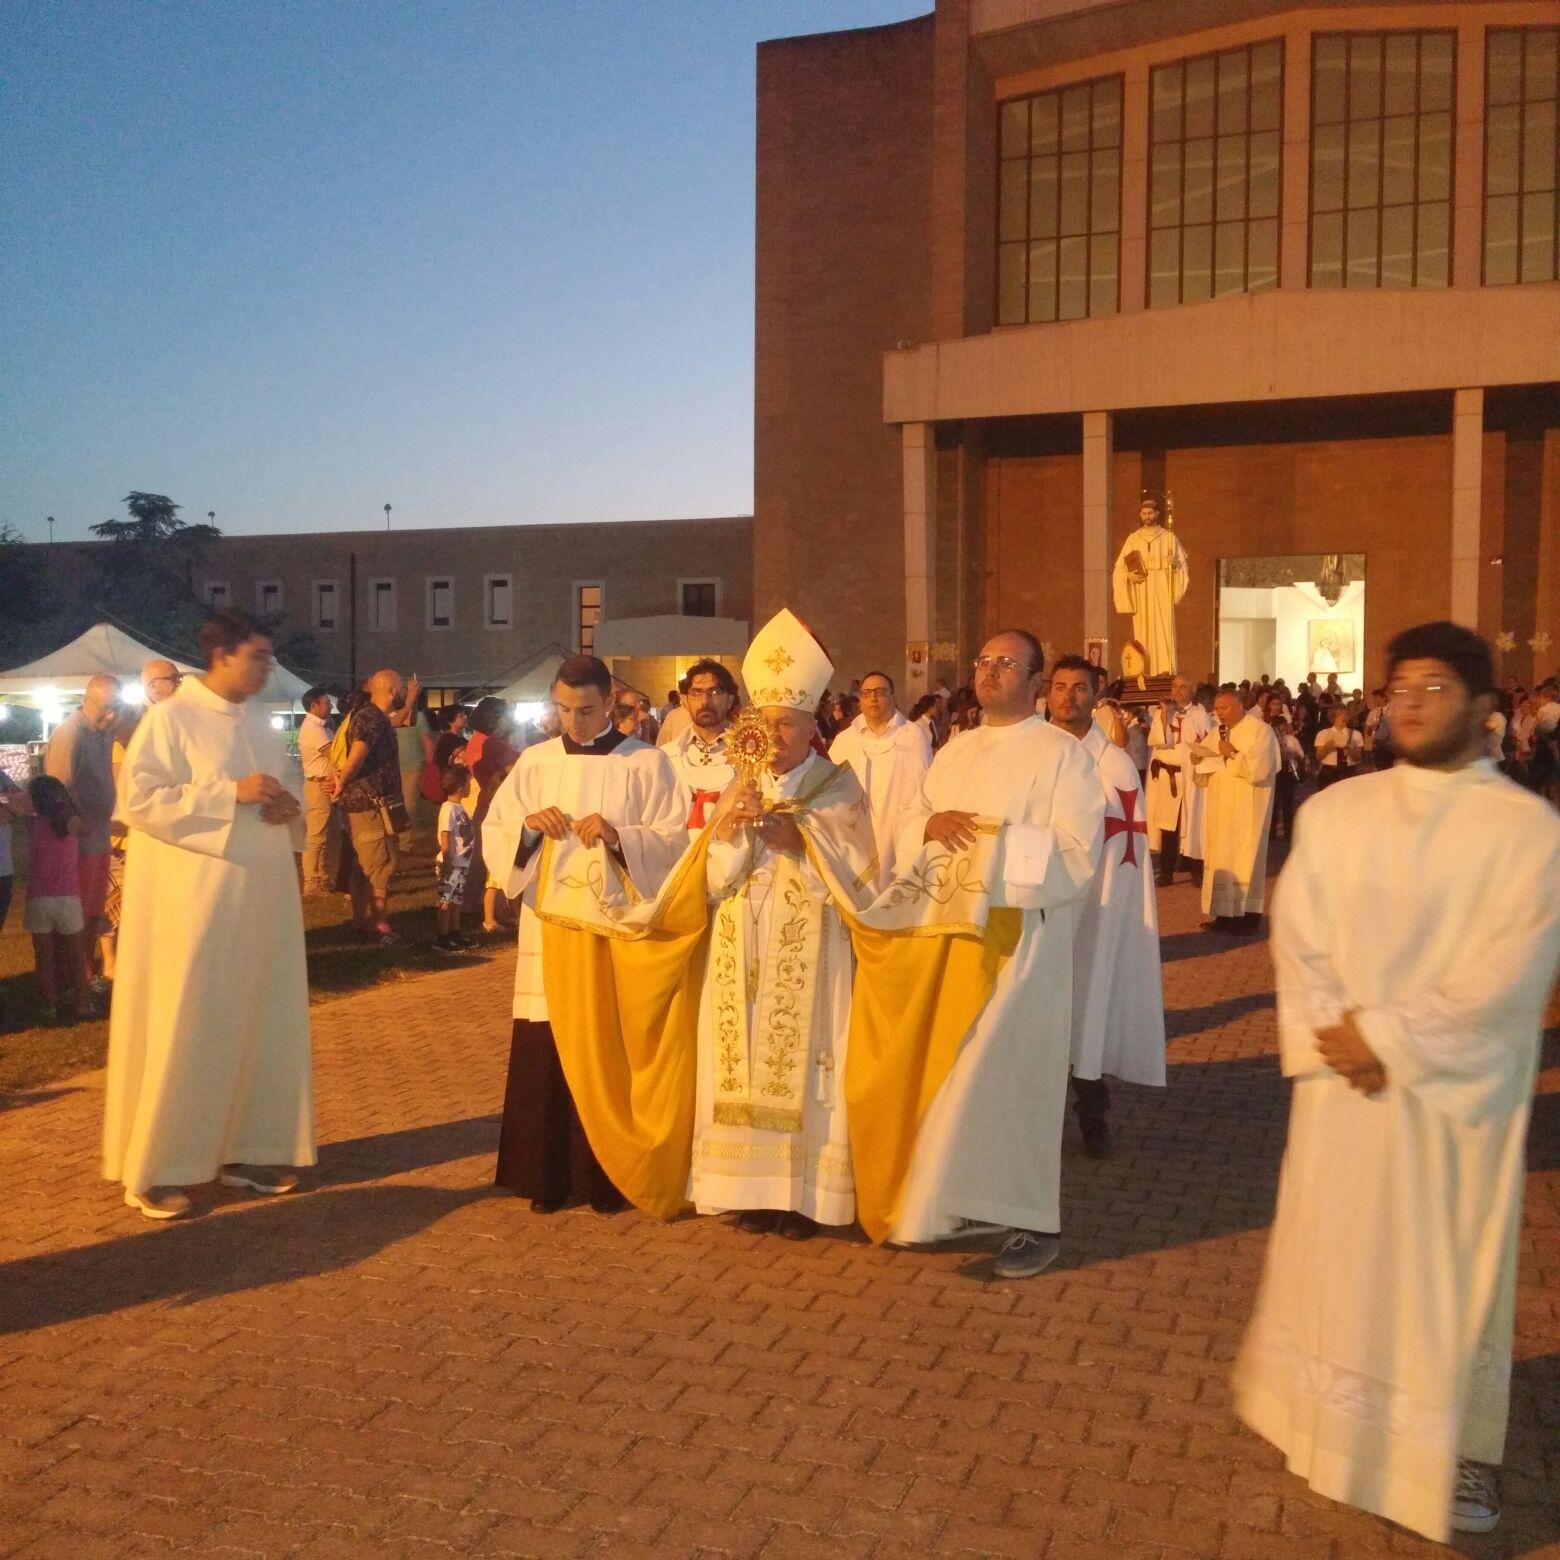 Festa di San Bernardo, S. Maria di Cotrino